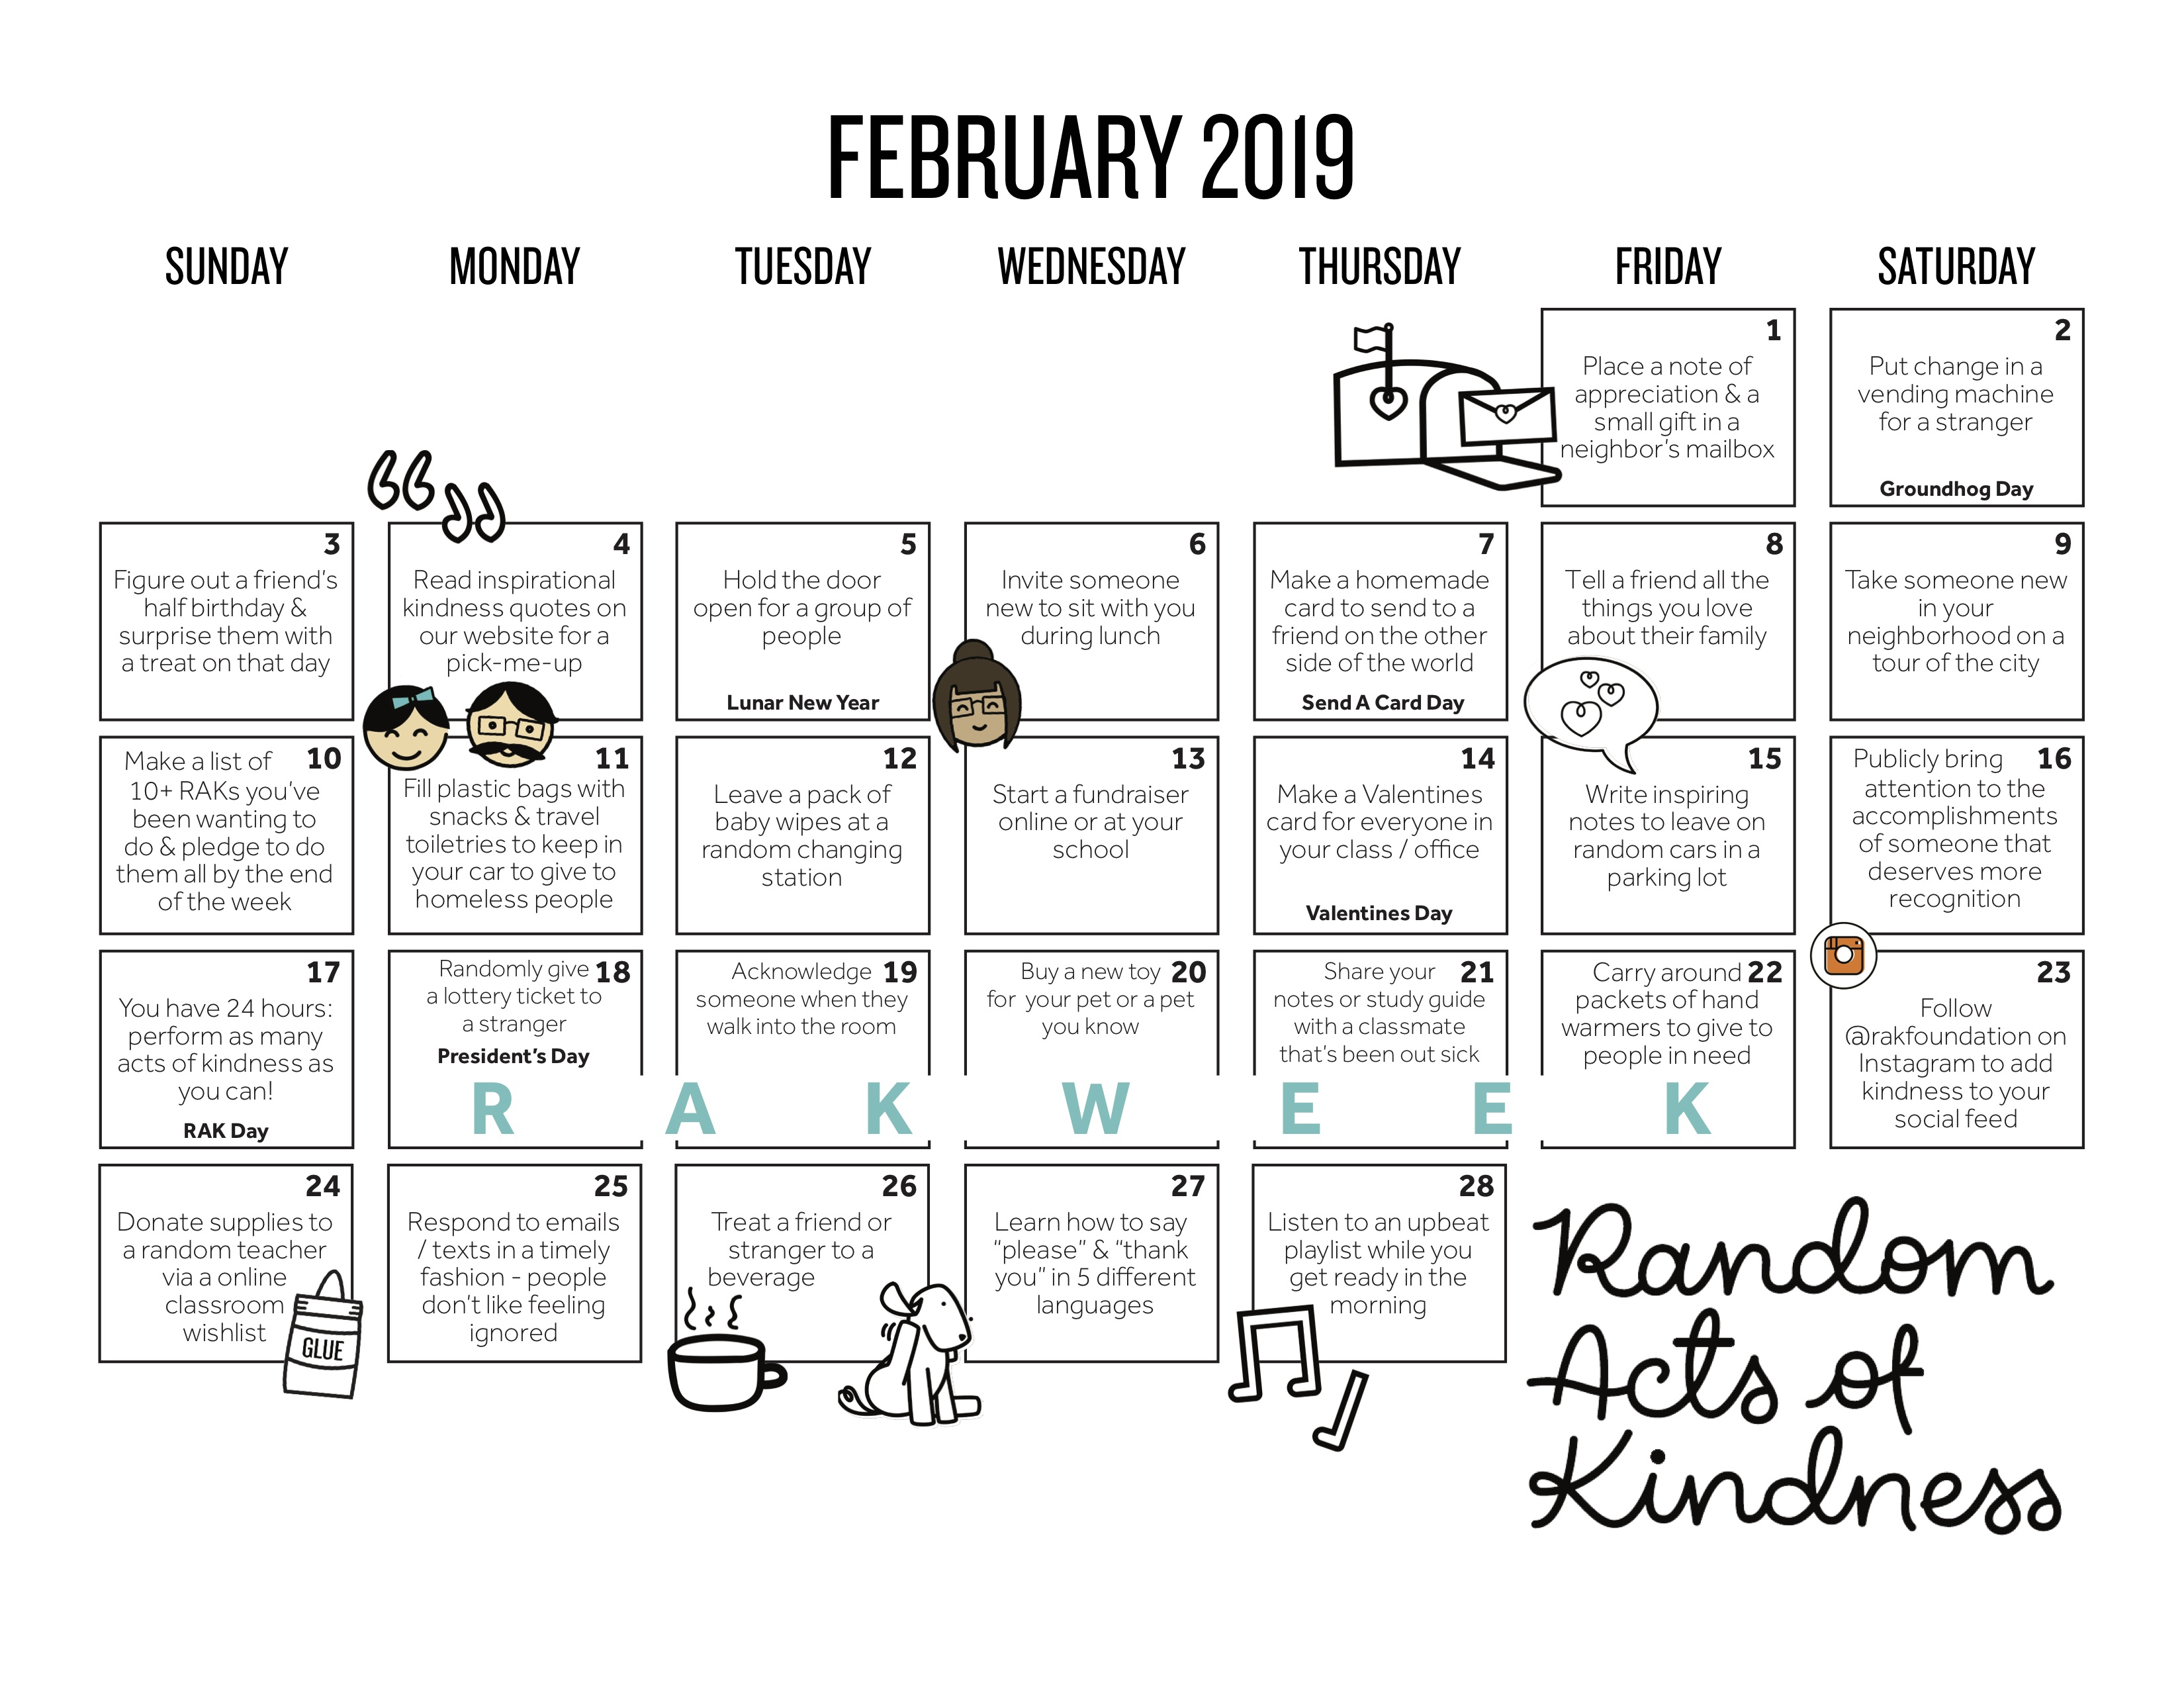 201902_kindness_calendar